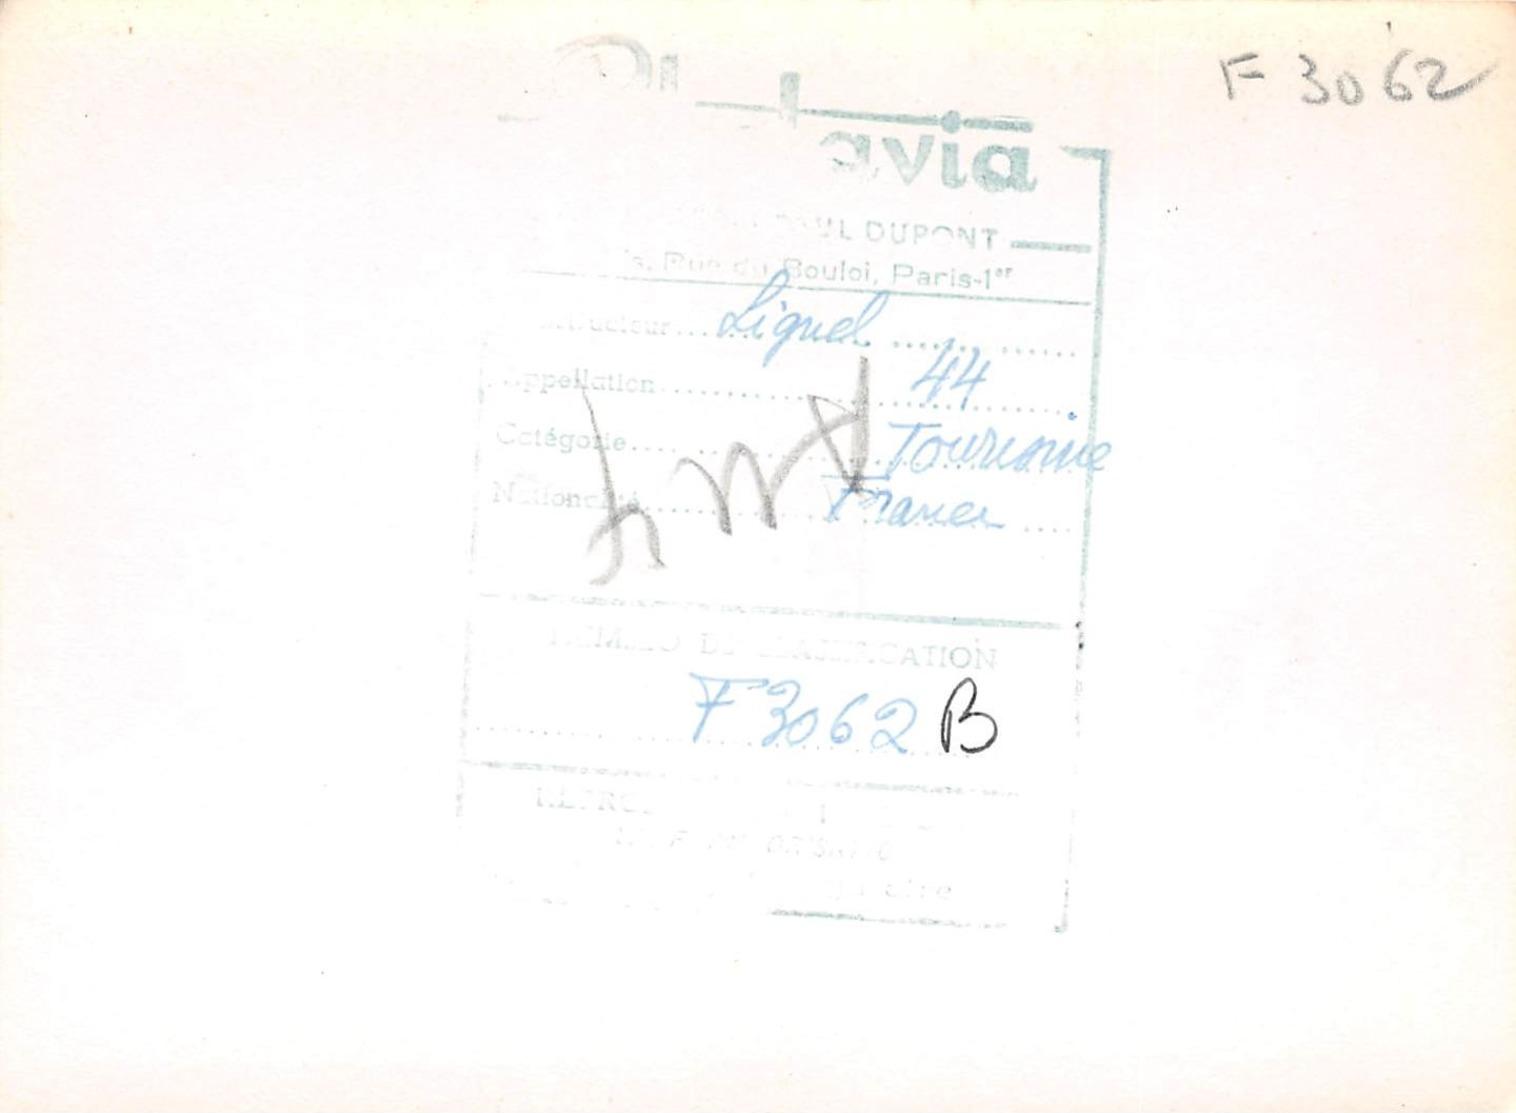 PHOTAVIA - S.F.C.A LIGNEL 44 CROSS COUNTRY DÉRIVÉ DU S.F.C.A TAUPIN - 1946 - Aviation